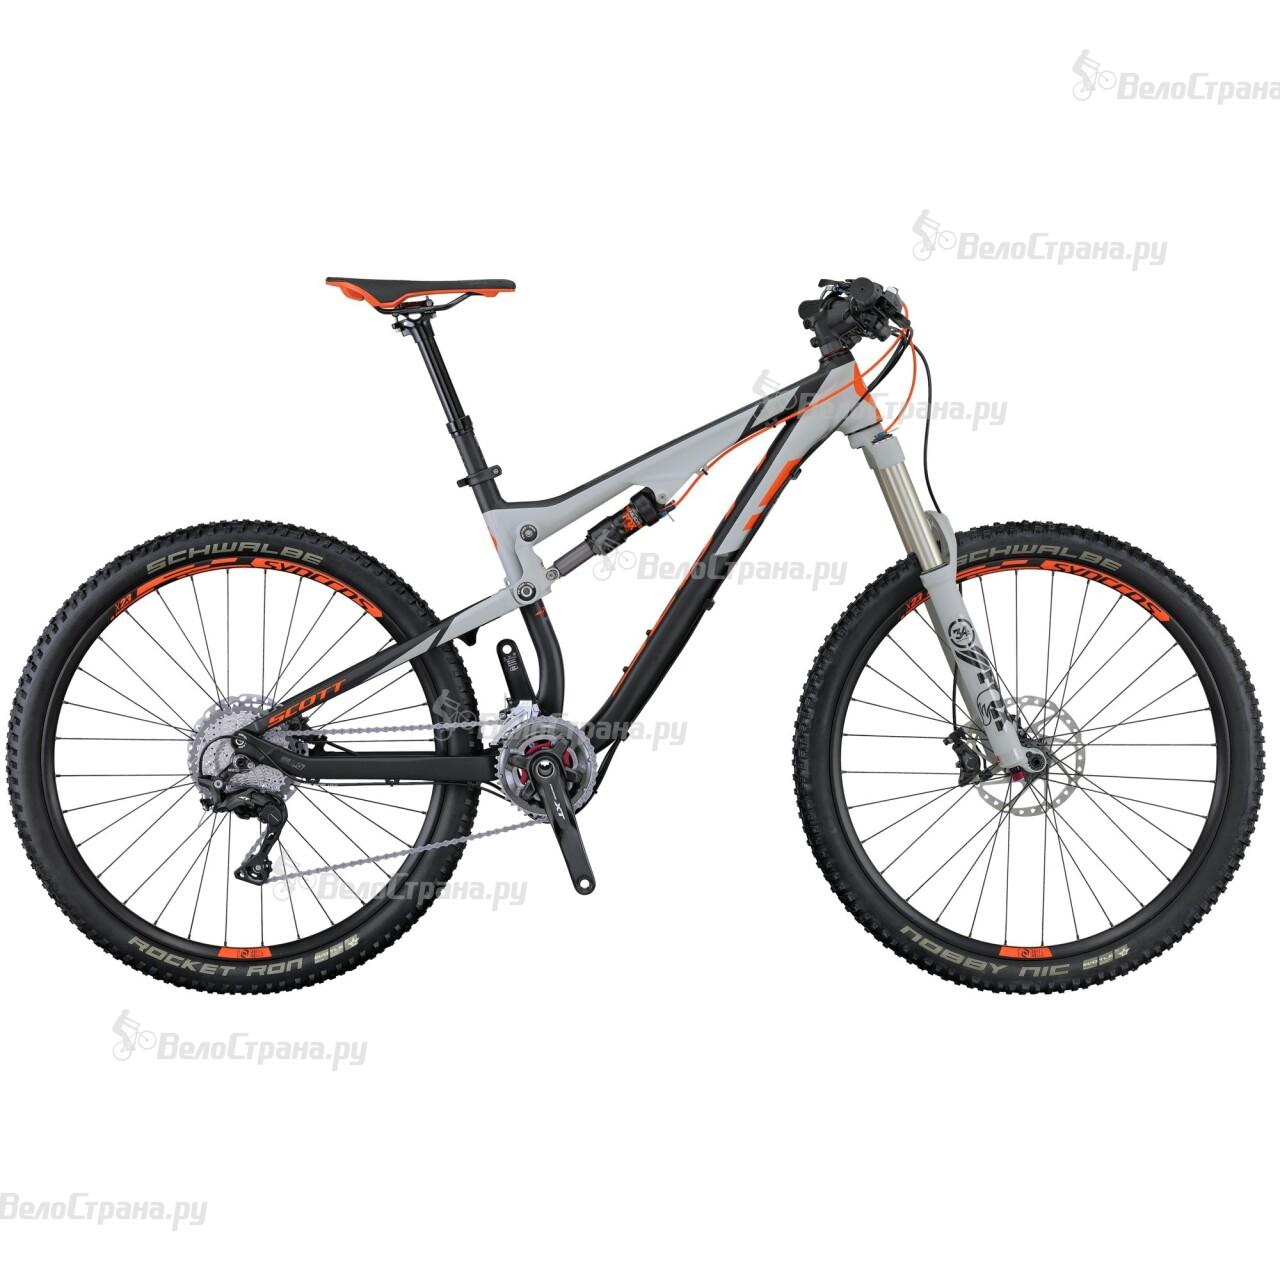 Велосипед Scott Genius 730 (2016) genius hs 300a silver